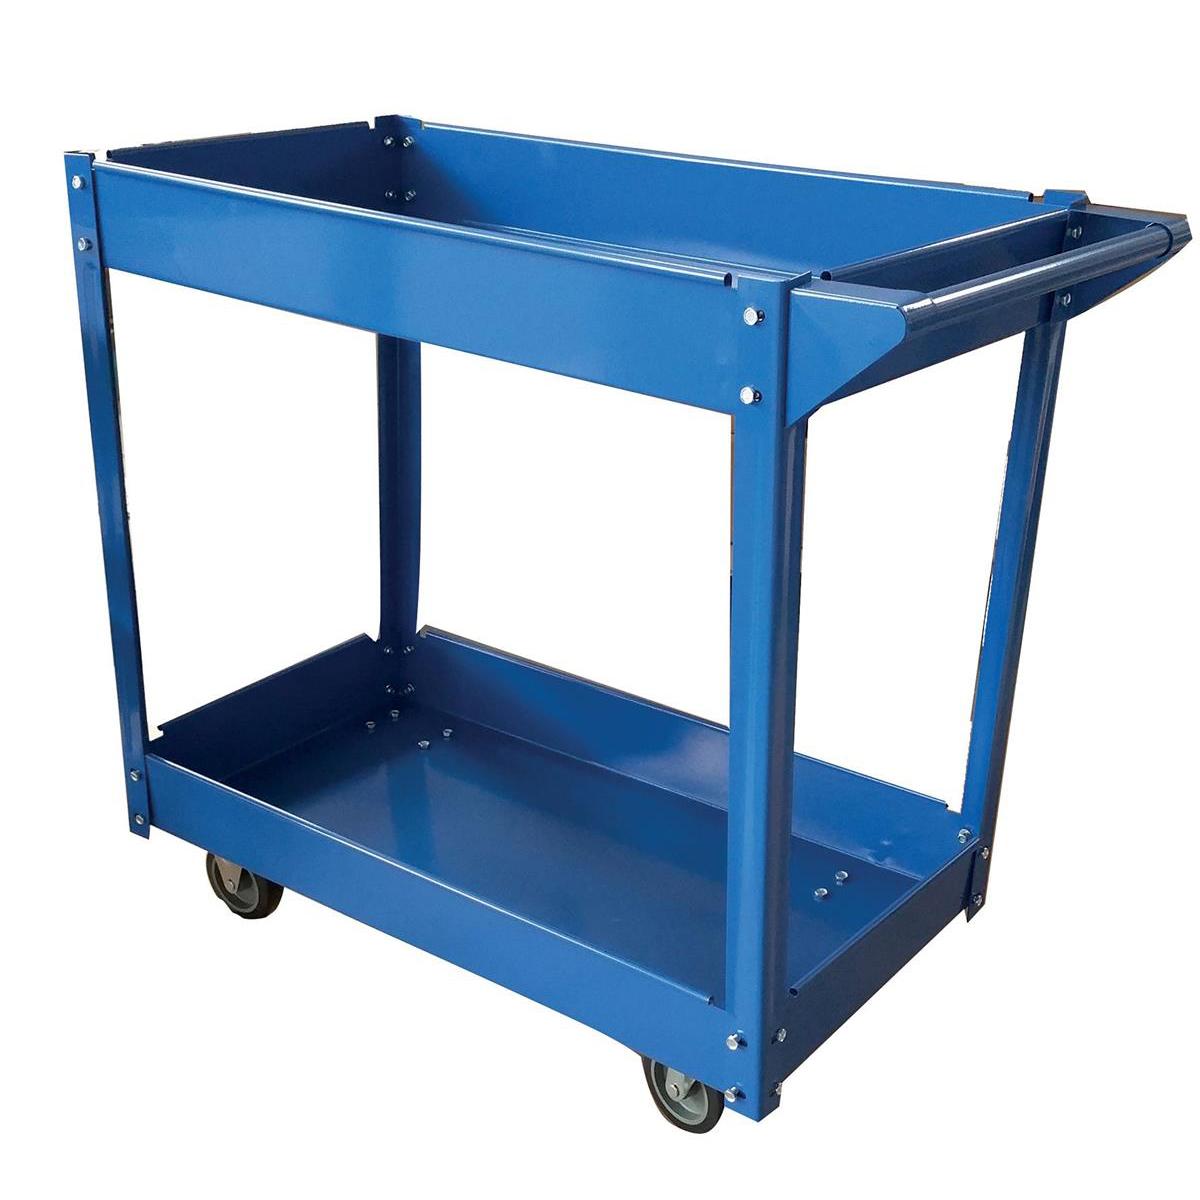 5 Star Facilities Tray Trolley 2 Tier Blue